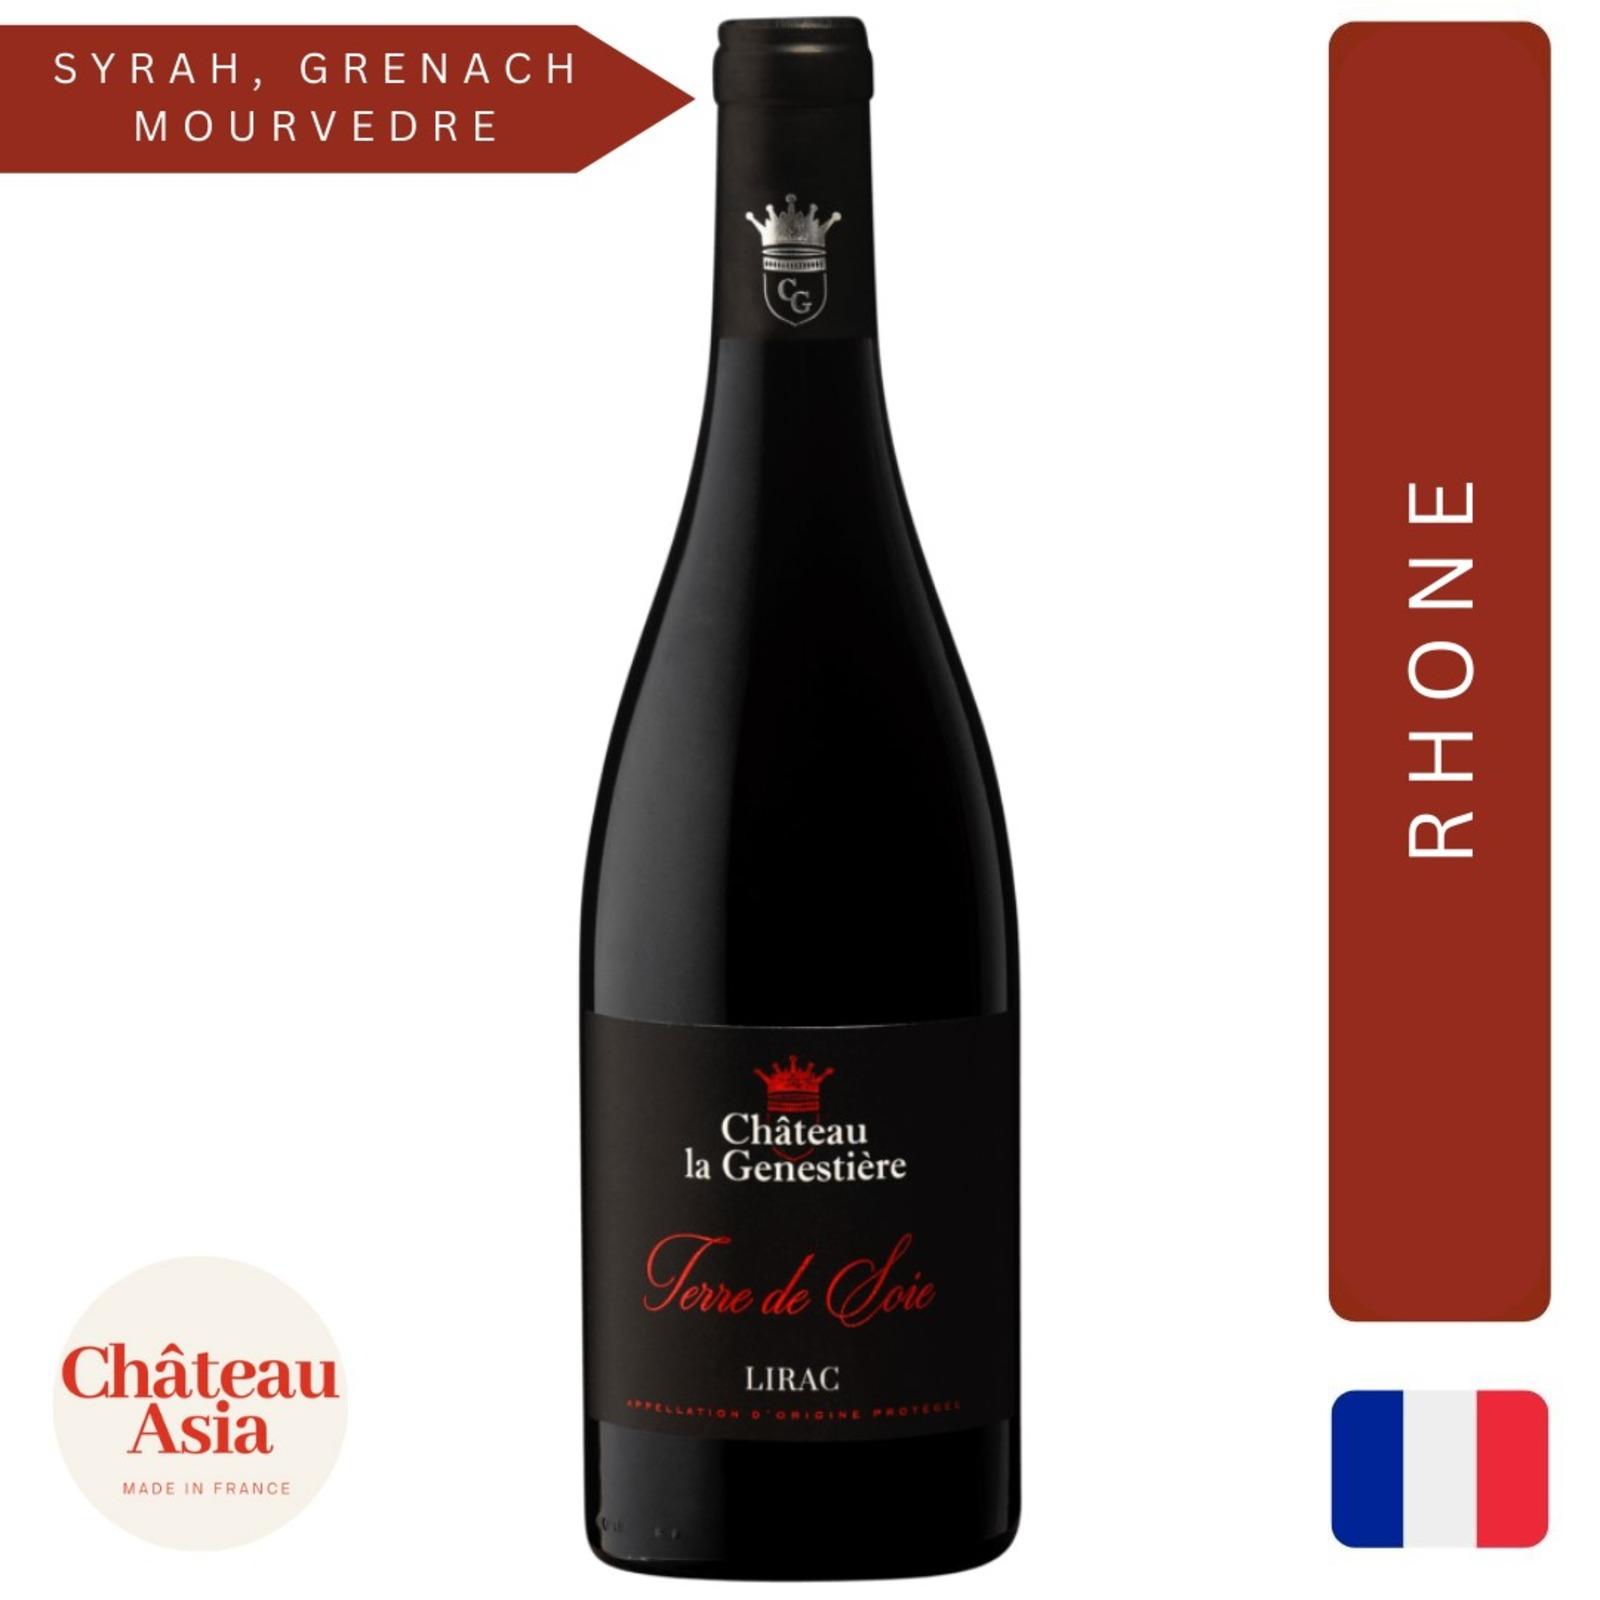 Chateau La Genestiere - Lirac Terre de Soie - Red Wine